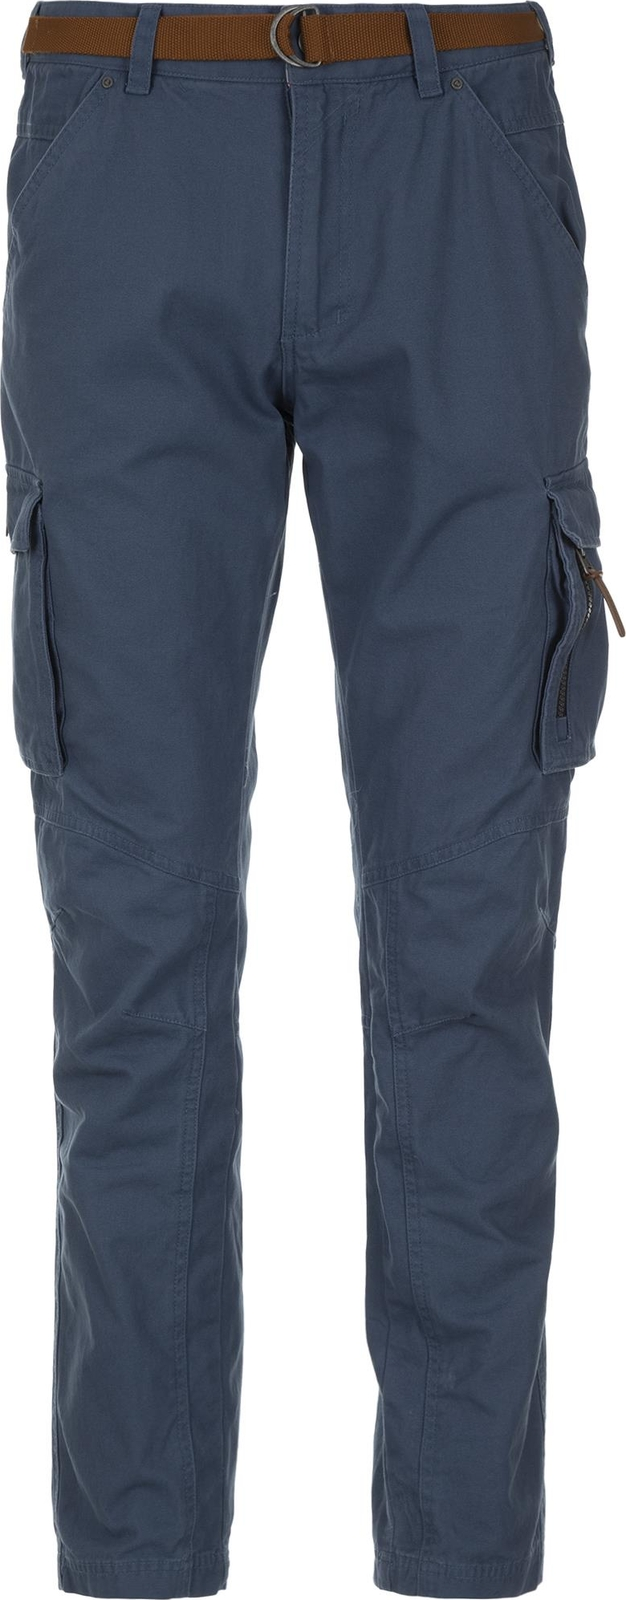 Брюки Merrell Men's Pants With Belt ботинки мужские merrell burnt rock tura mid suede цвет темно оливковый 95217 размер 11 5 46